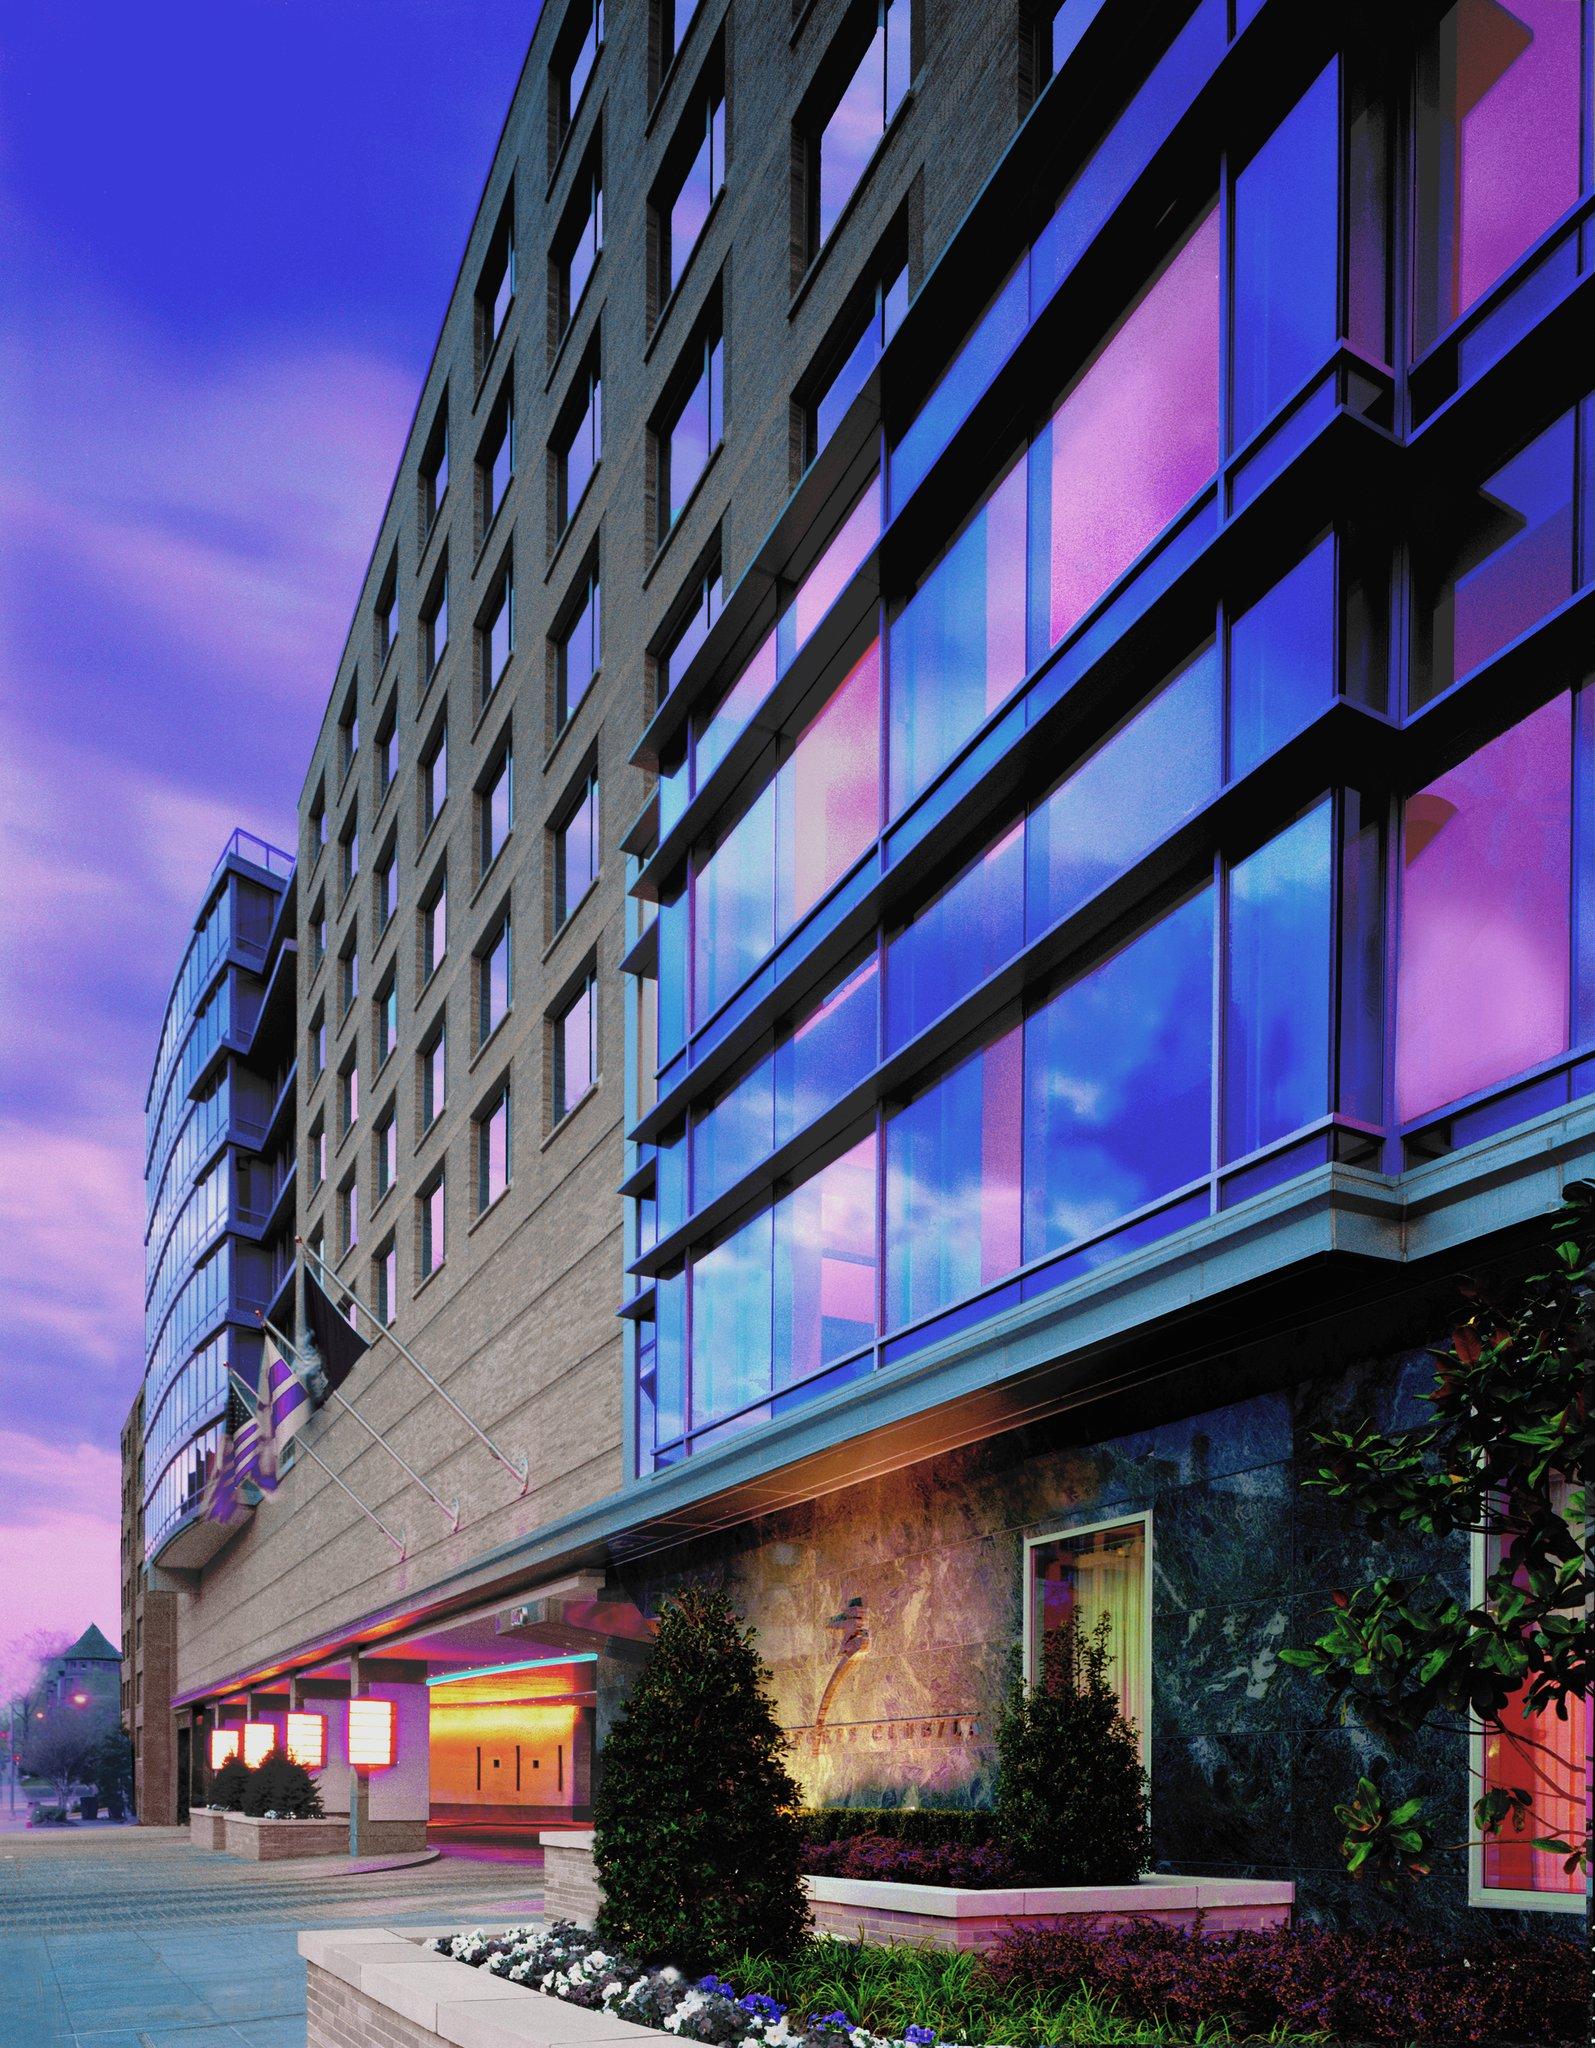 The Ritz-Carlton, Washington